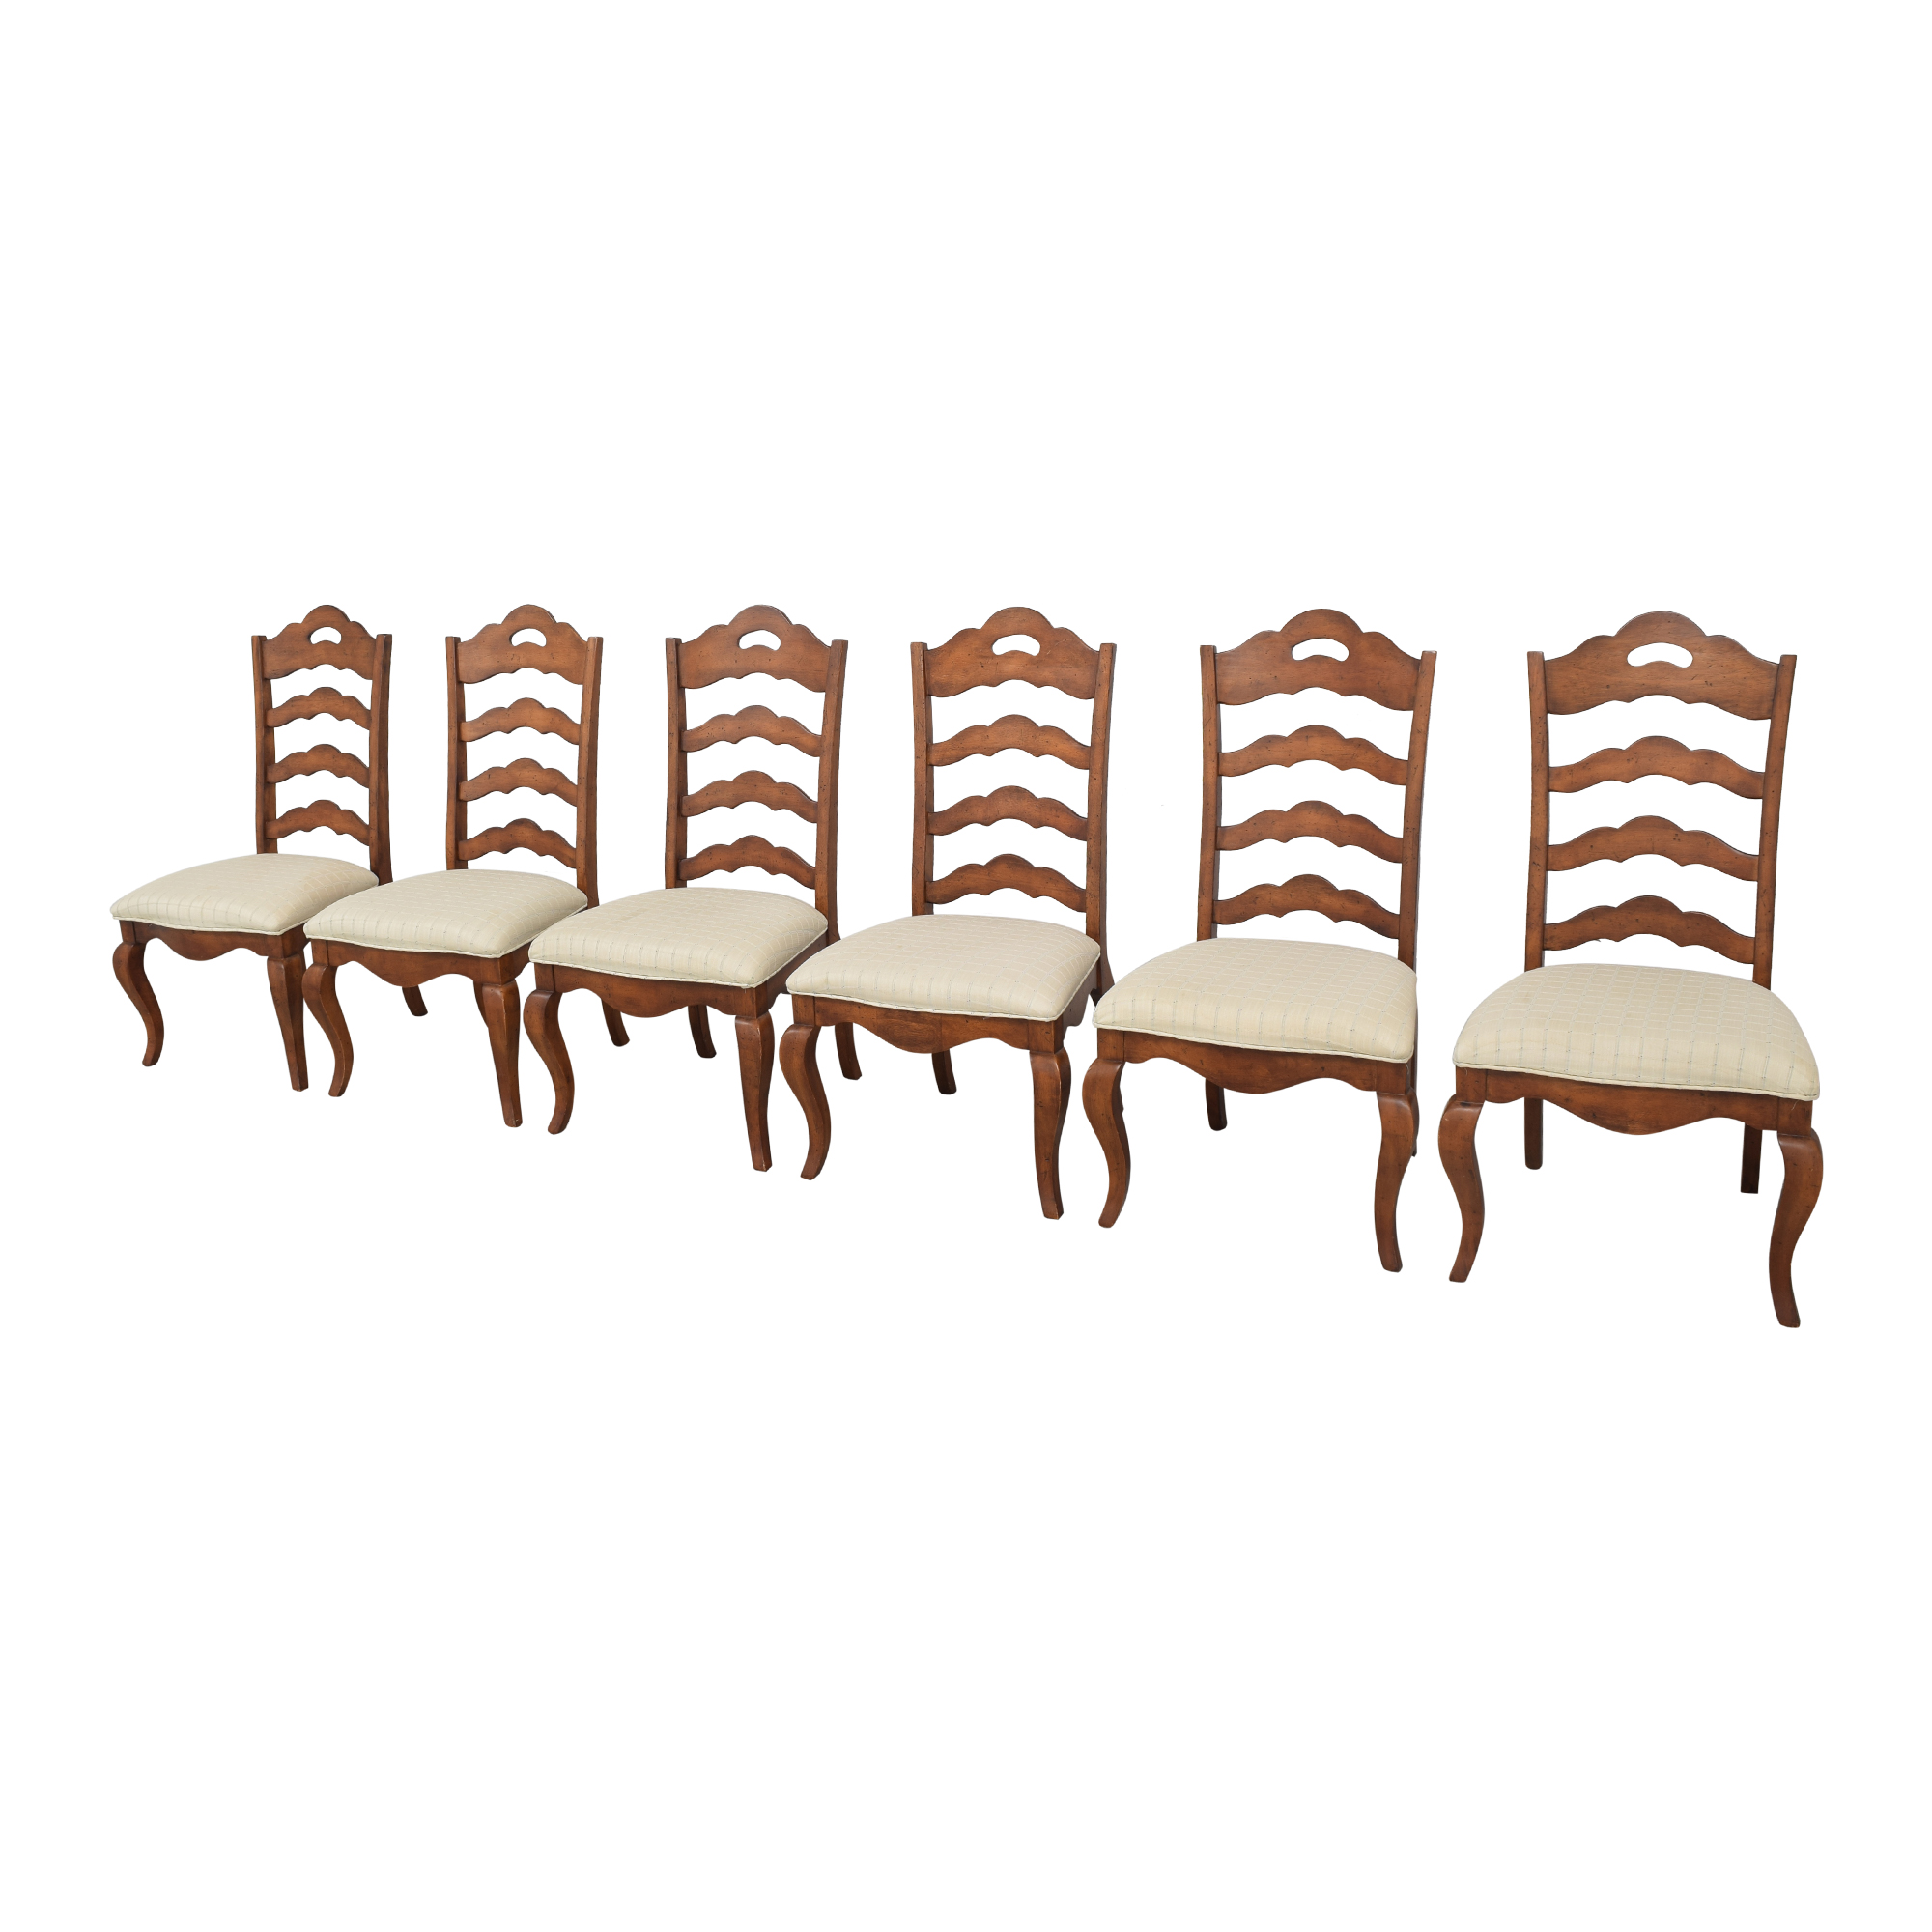 buy Universal Furniture Ladder Back Dining Chairs Universal Furniture Dining Chairs